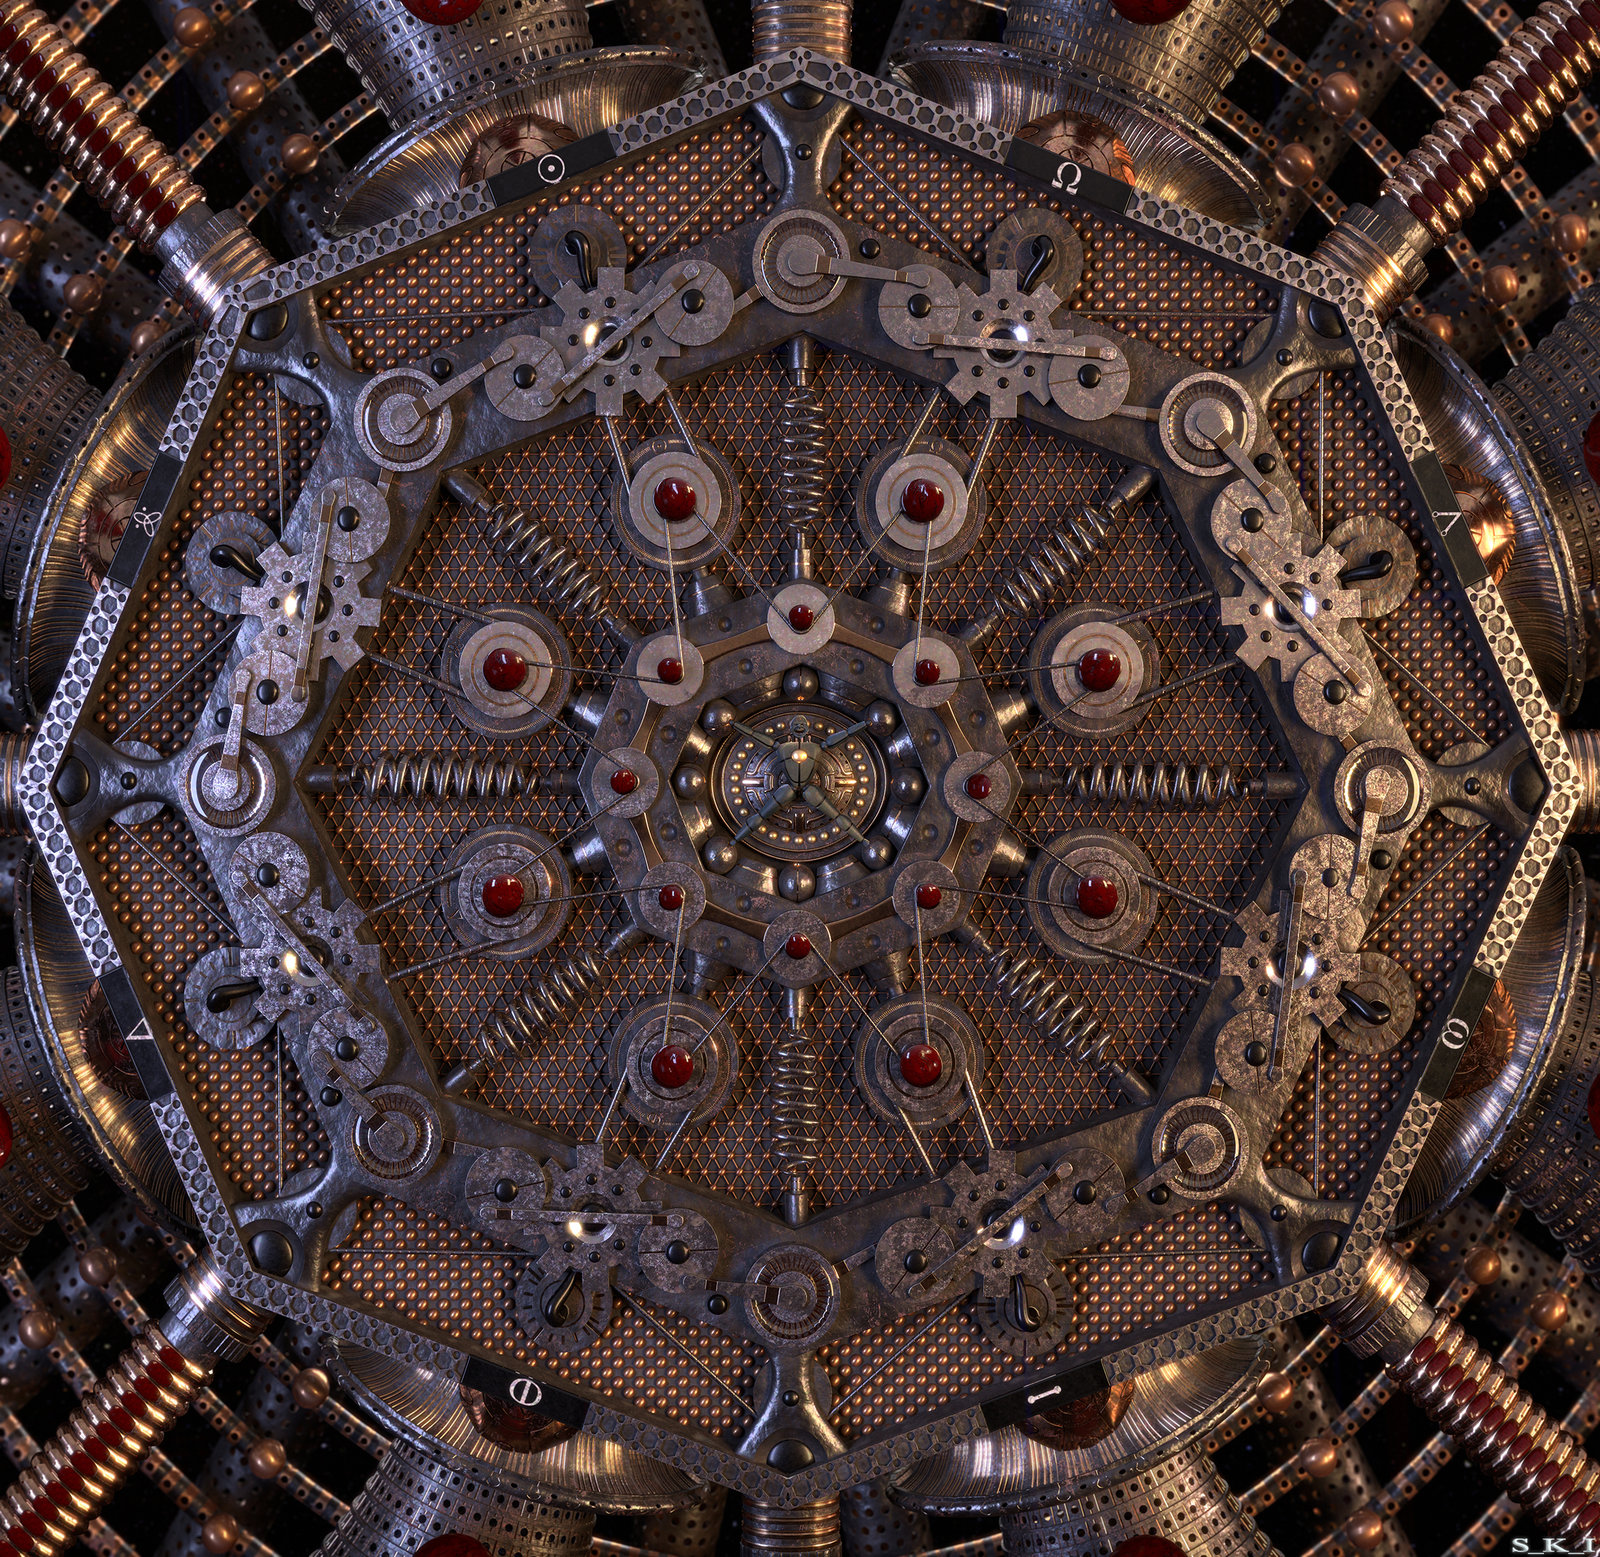 celestial_torture_by_iamski-d9y4v72.jpg